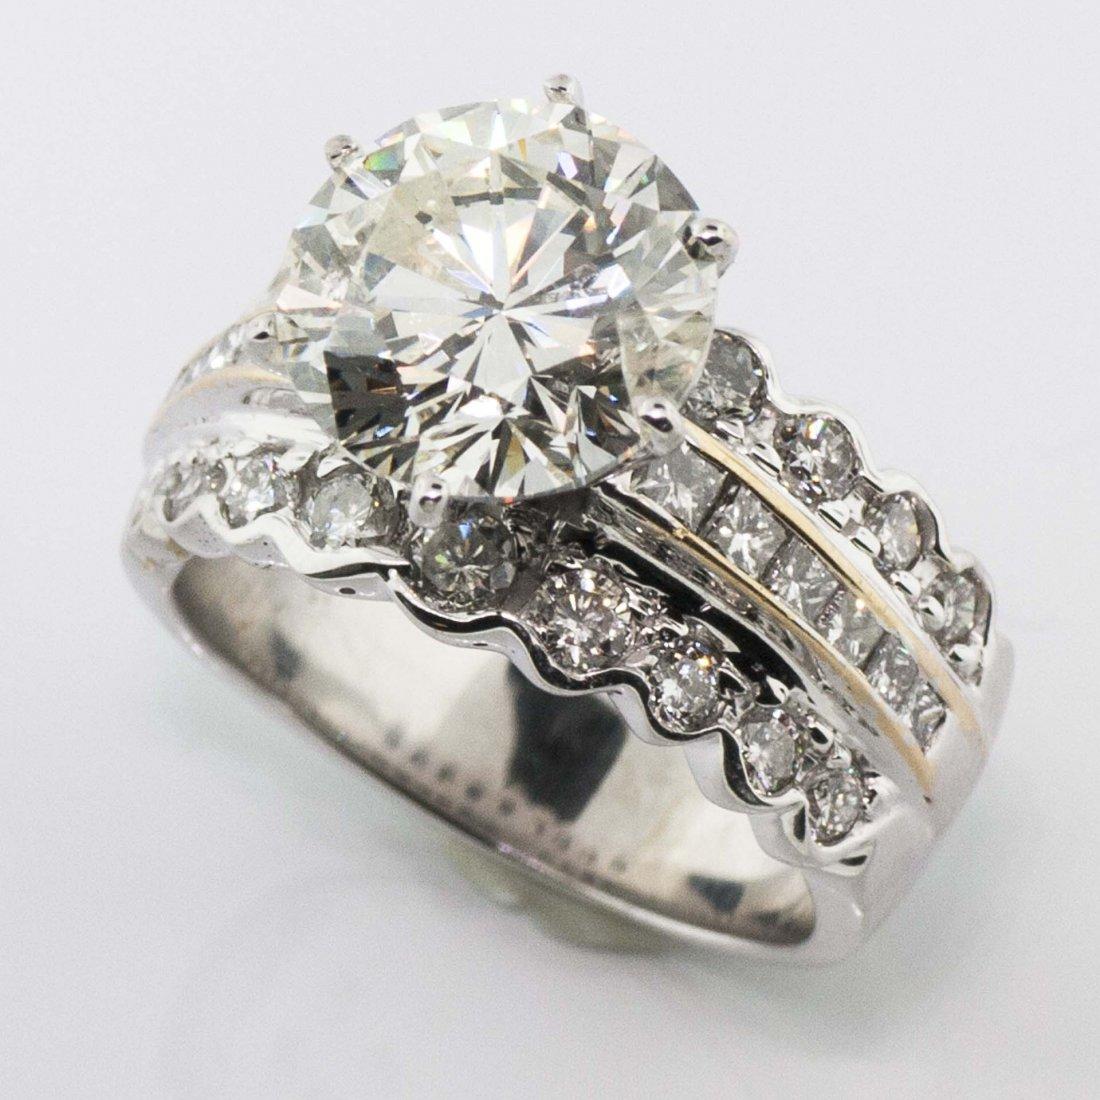 IGI CERTIFIED 4.54 CENTER H SI2 DIAMOND 6.13TW  RING!